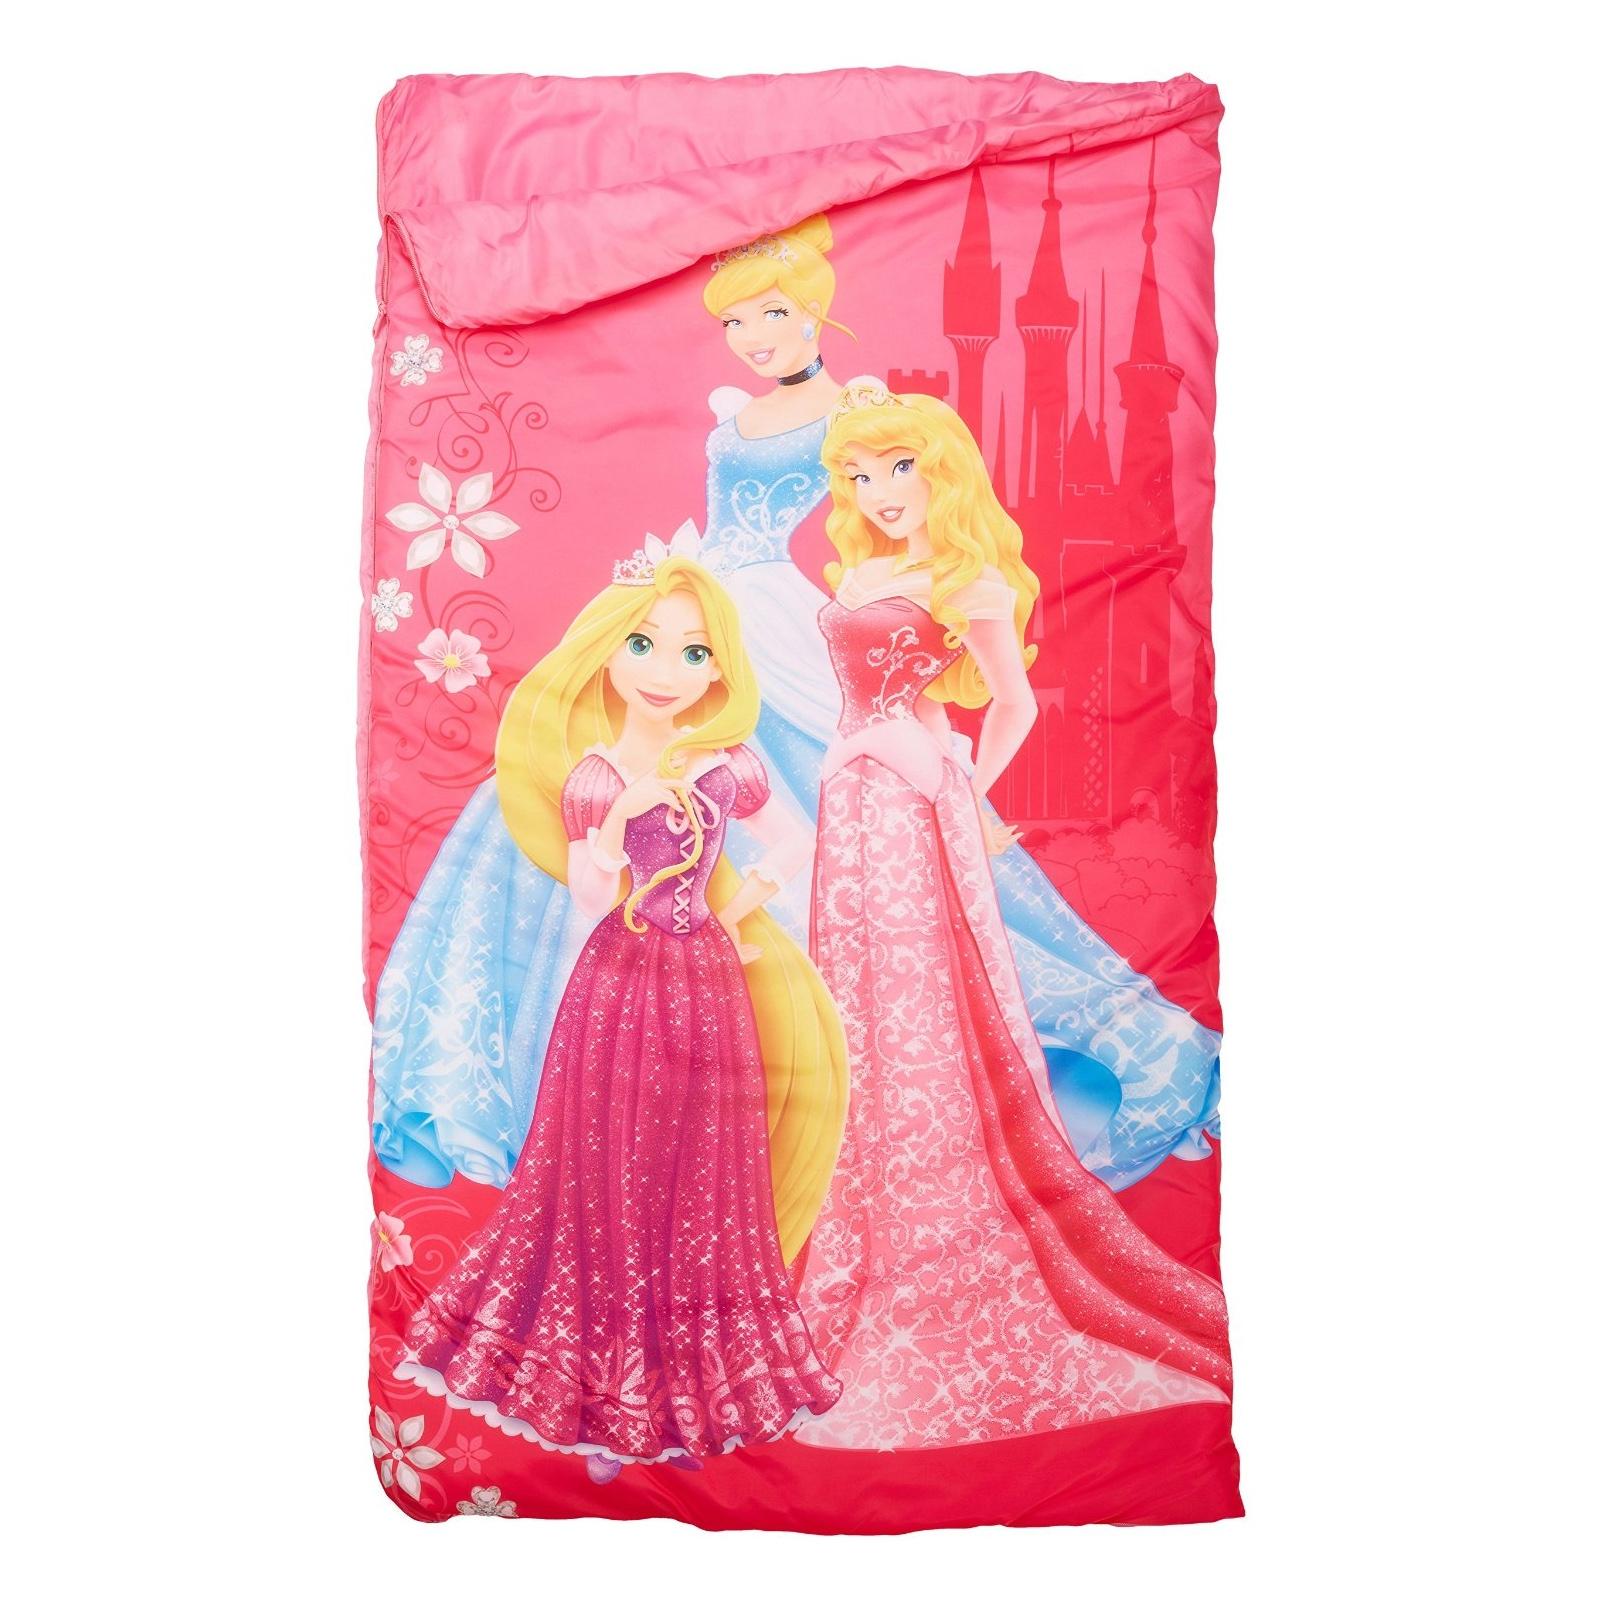 Disney Princess Indoor Slumber Sleeping Bag With Drawstring